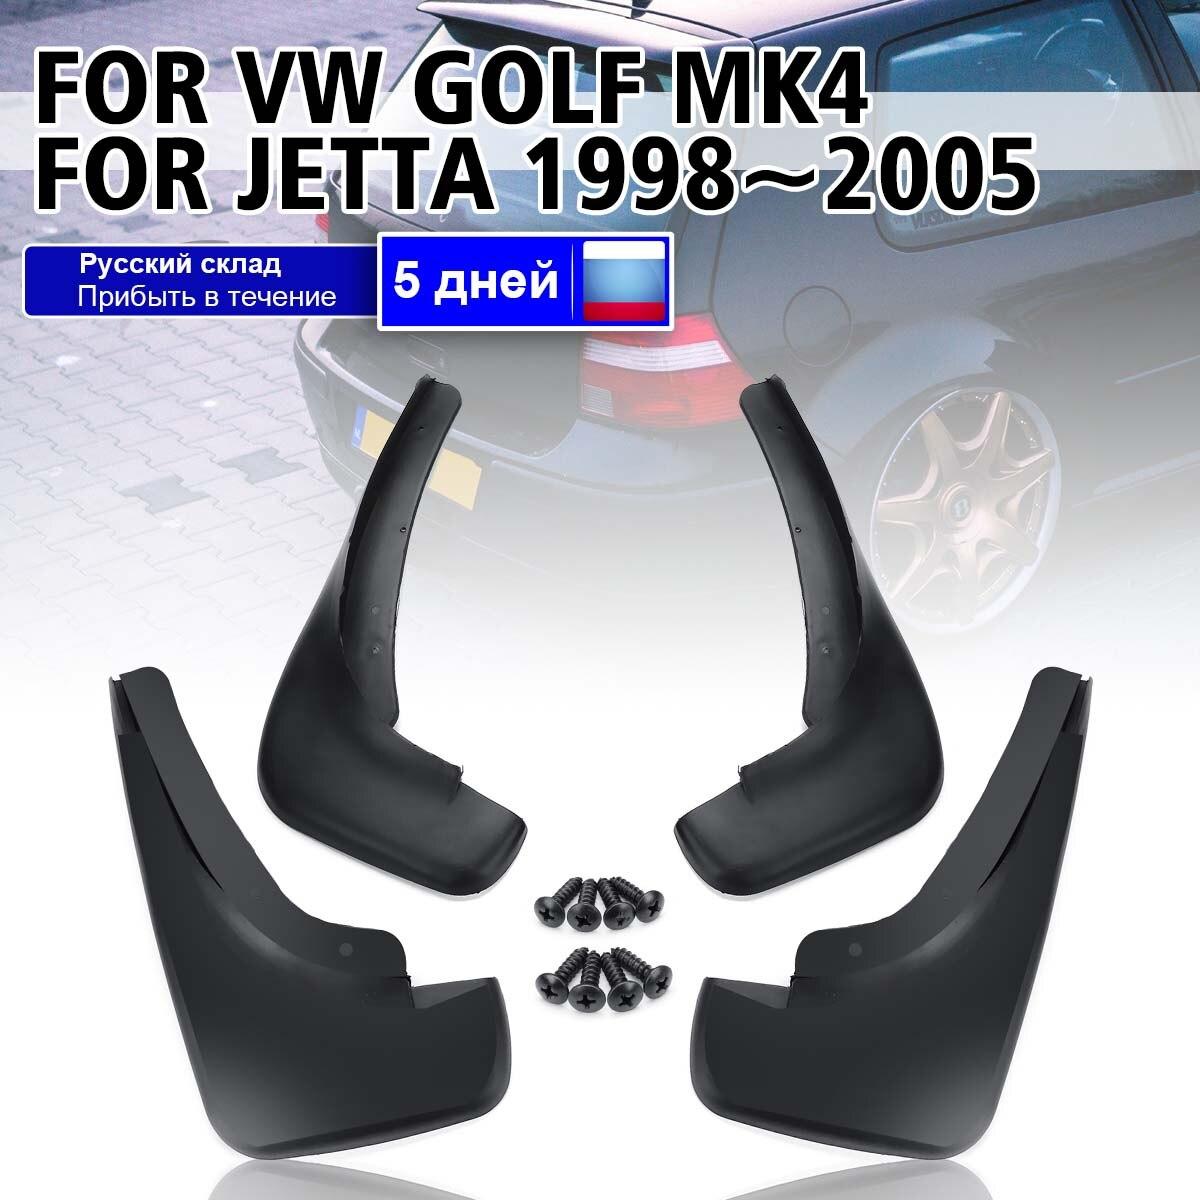 Lembi di Fango auto Per VW Golf 4 Mk4 IV Bora Jetta 1998-2005 Paraspruzzi Paraspruzzi Anteriore Parafango Posteriore parafanghi